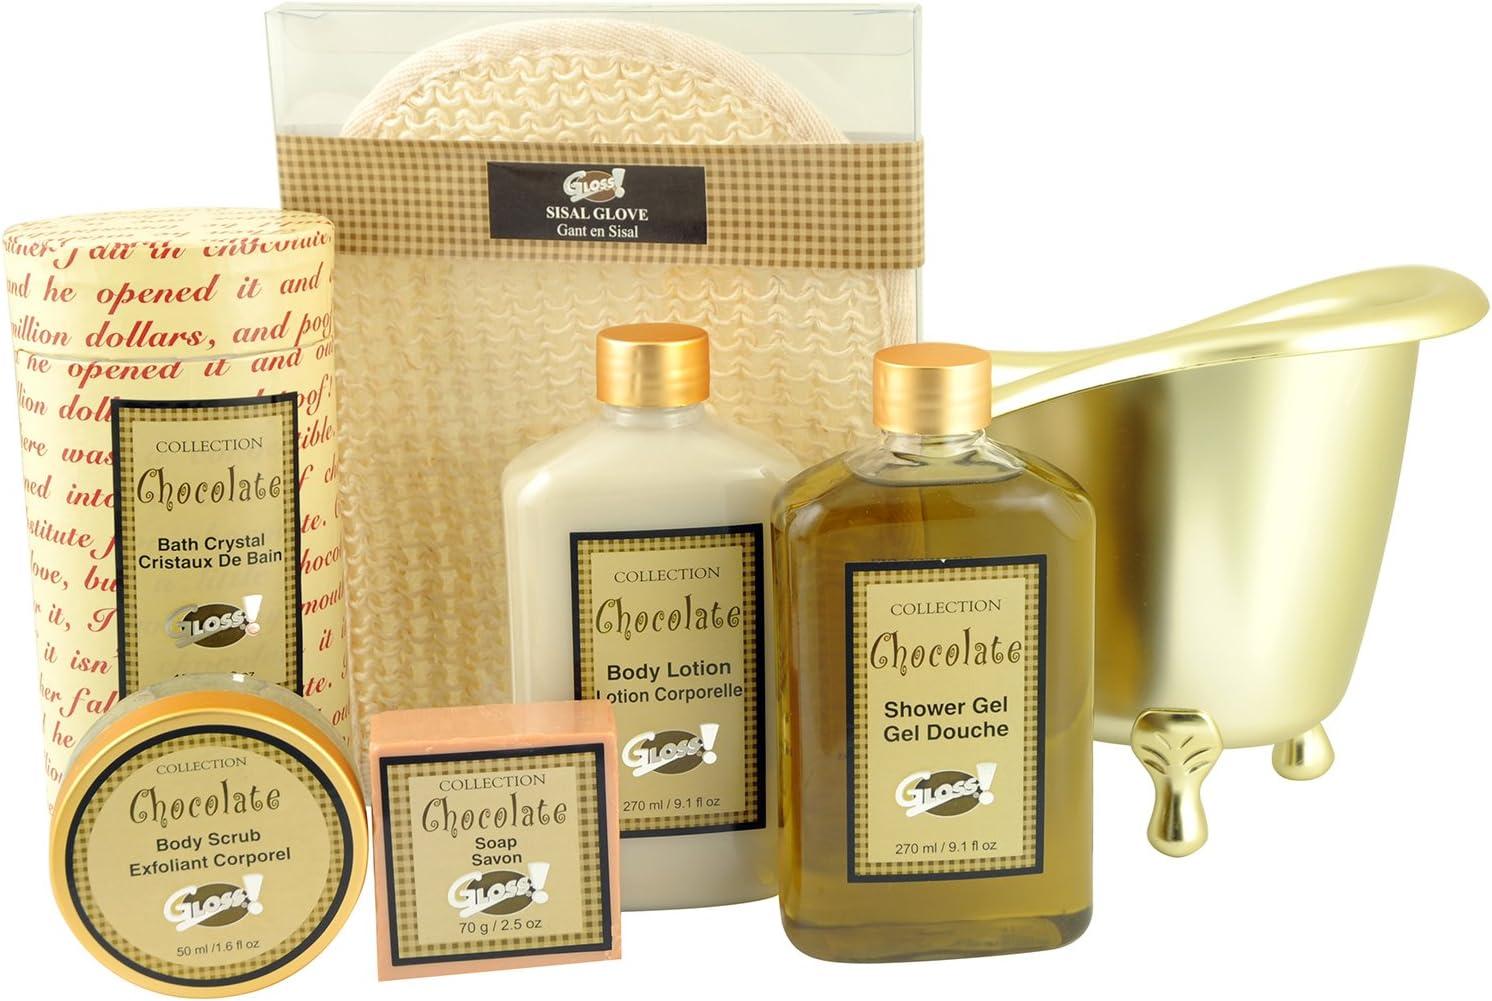 Gloss - caja de baño, caja de regalo para mujeres - Bañera de Baño Regalo - Chocolate: Amazon.es: Belleza